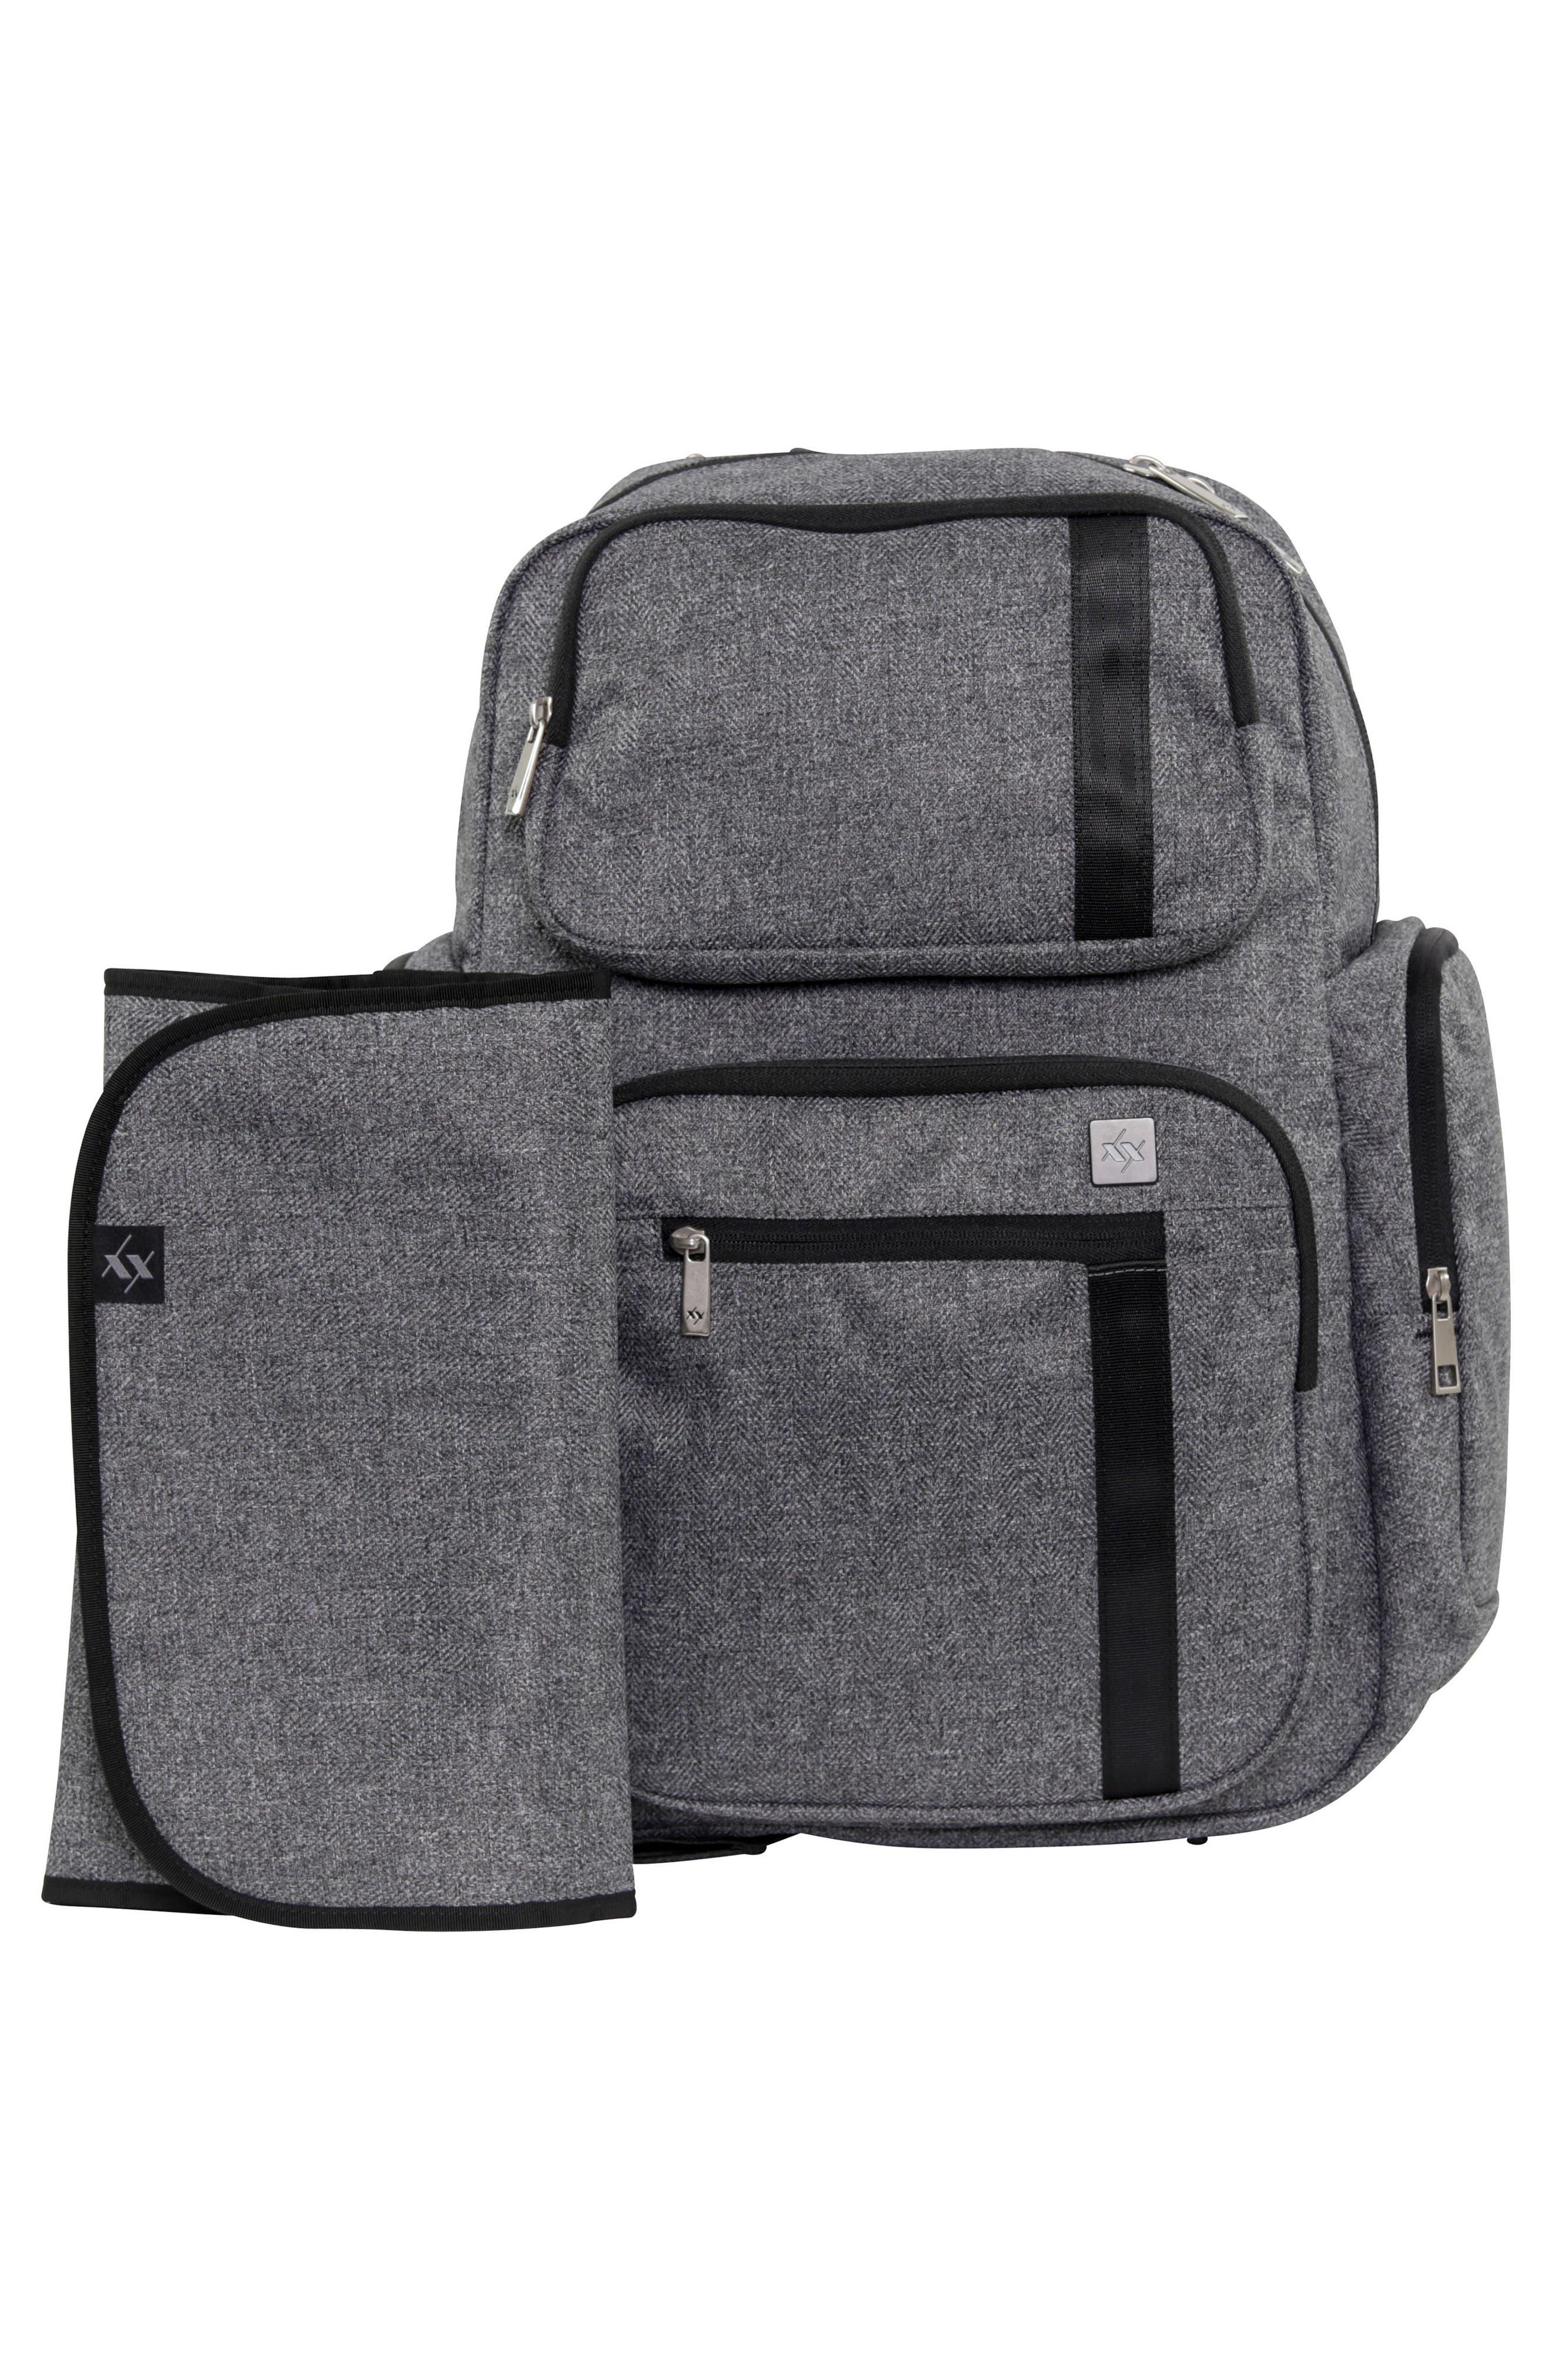 XY Vector Diaper Backpack,                             Alternate thumbnail 4, color,                             GRAY MATTER